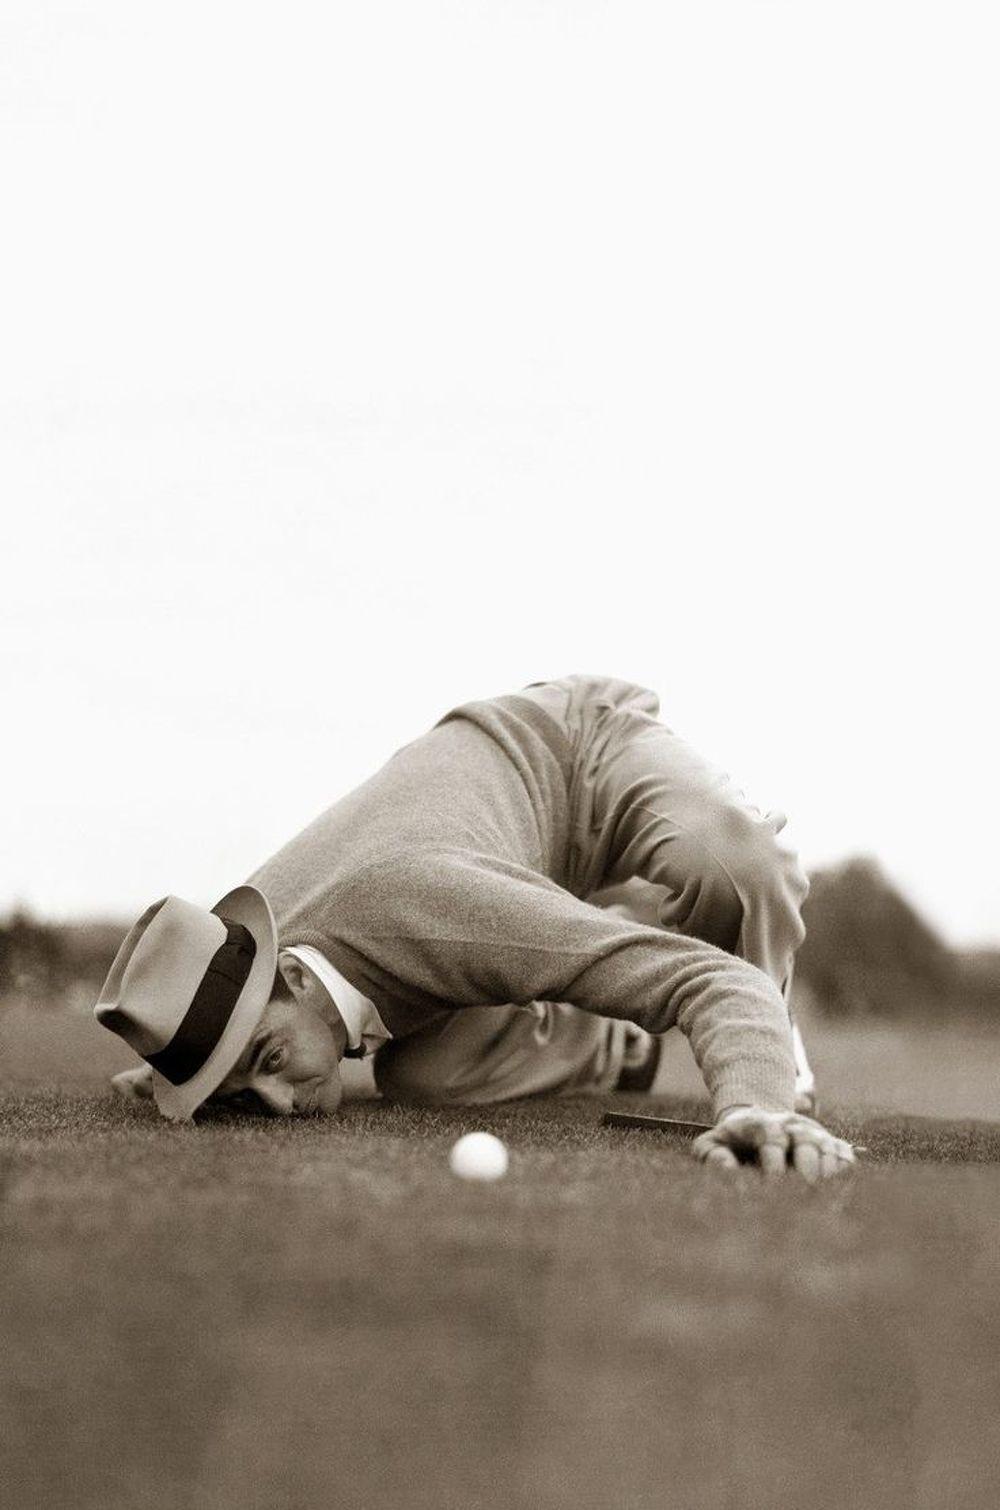 How to putt slow bumpy greens golf digest tips golf